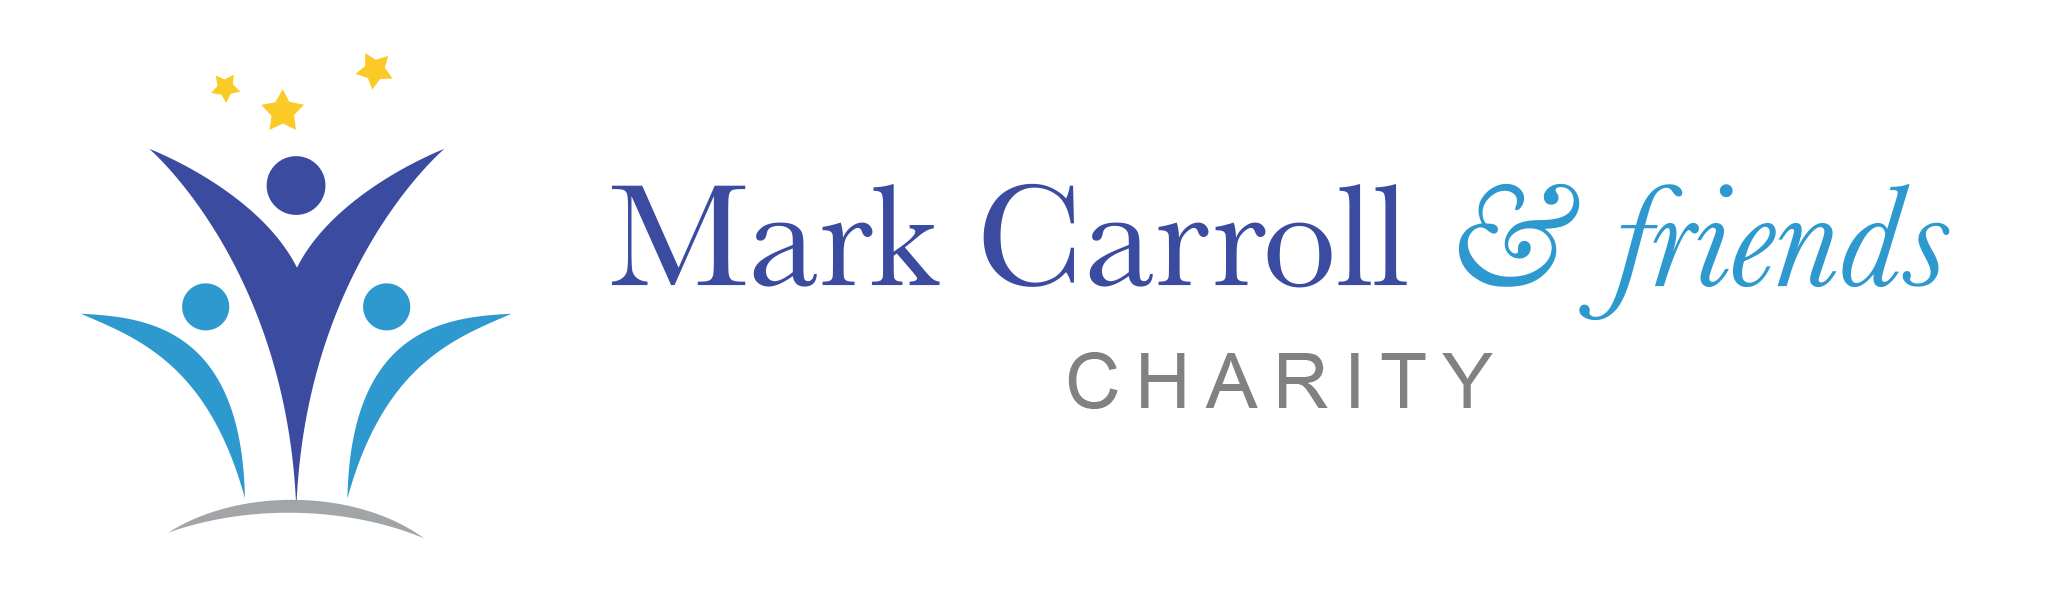 MarkCarrol.png